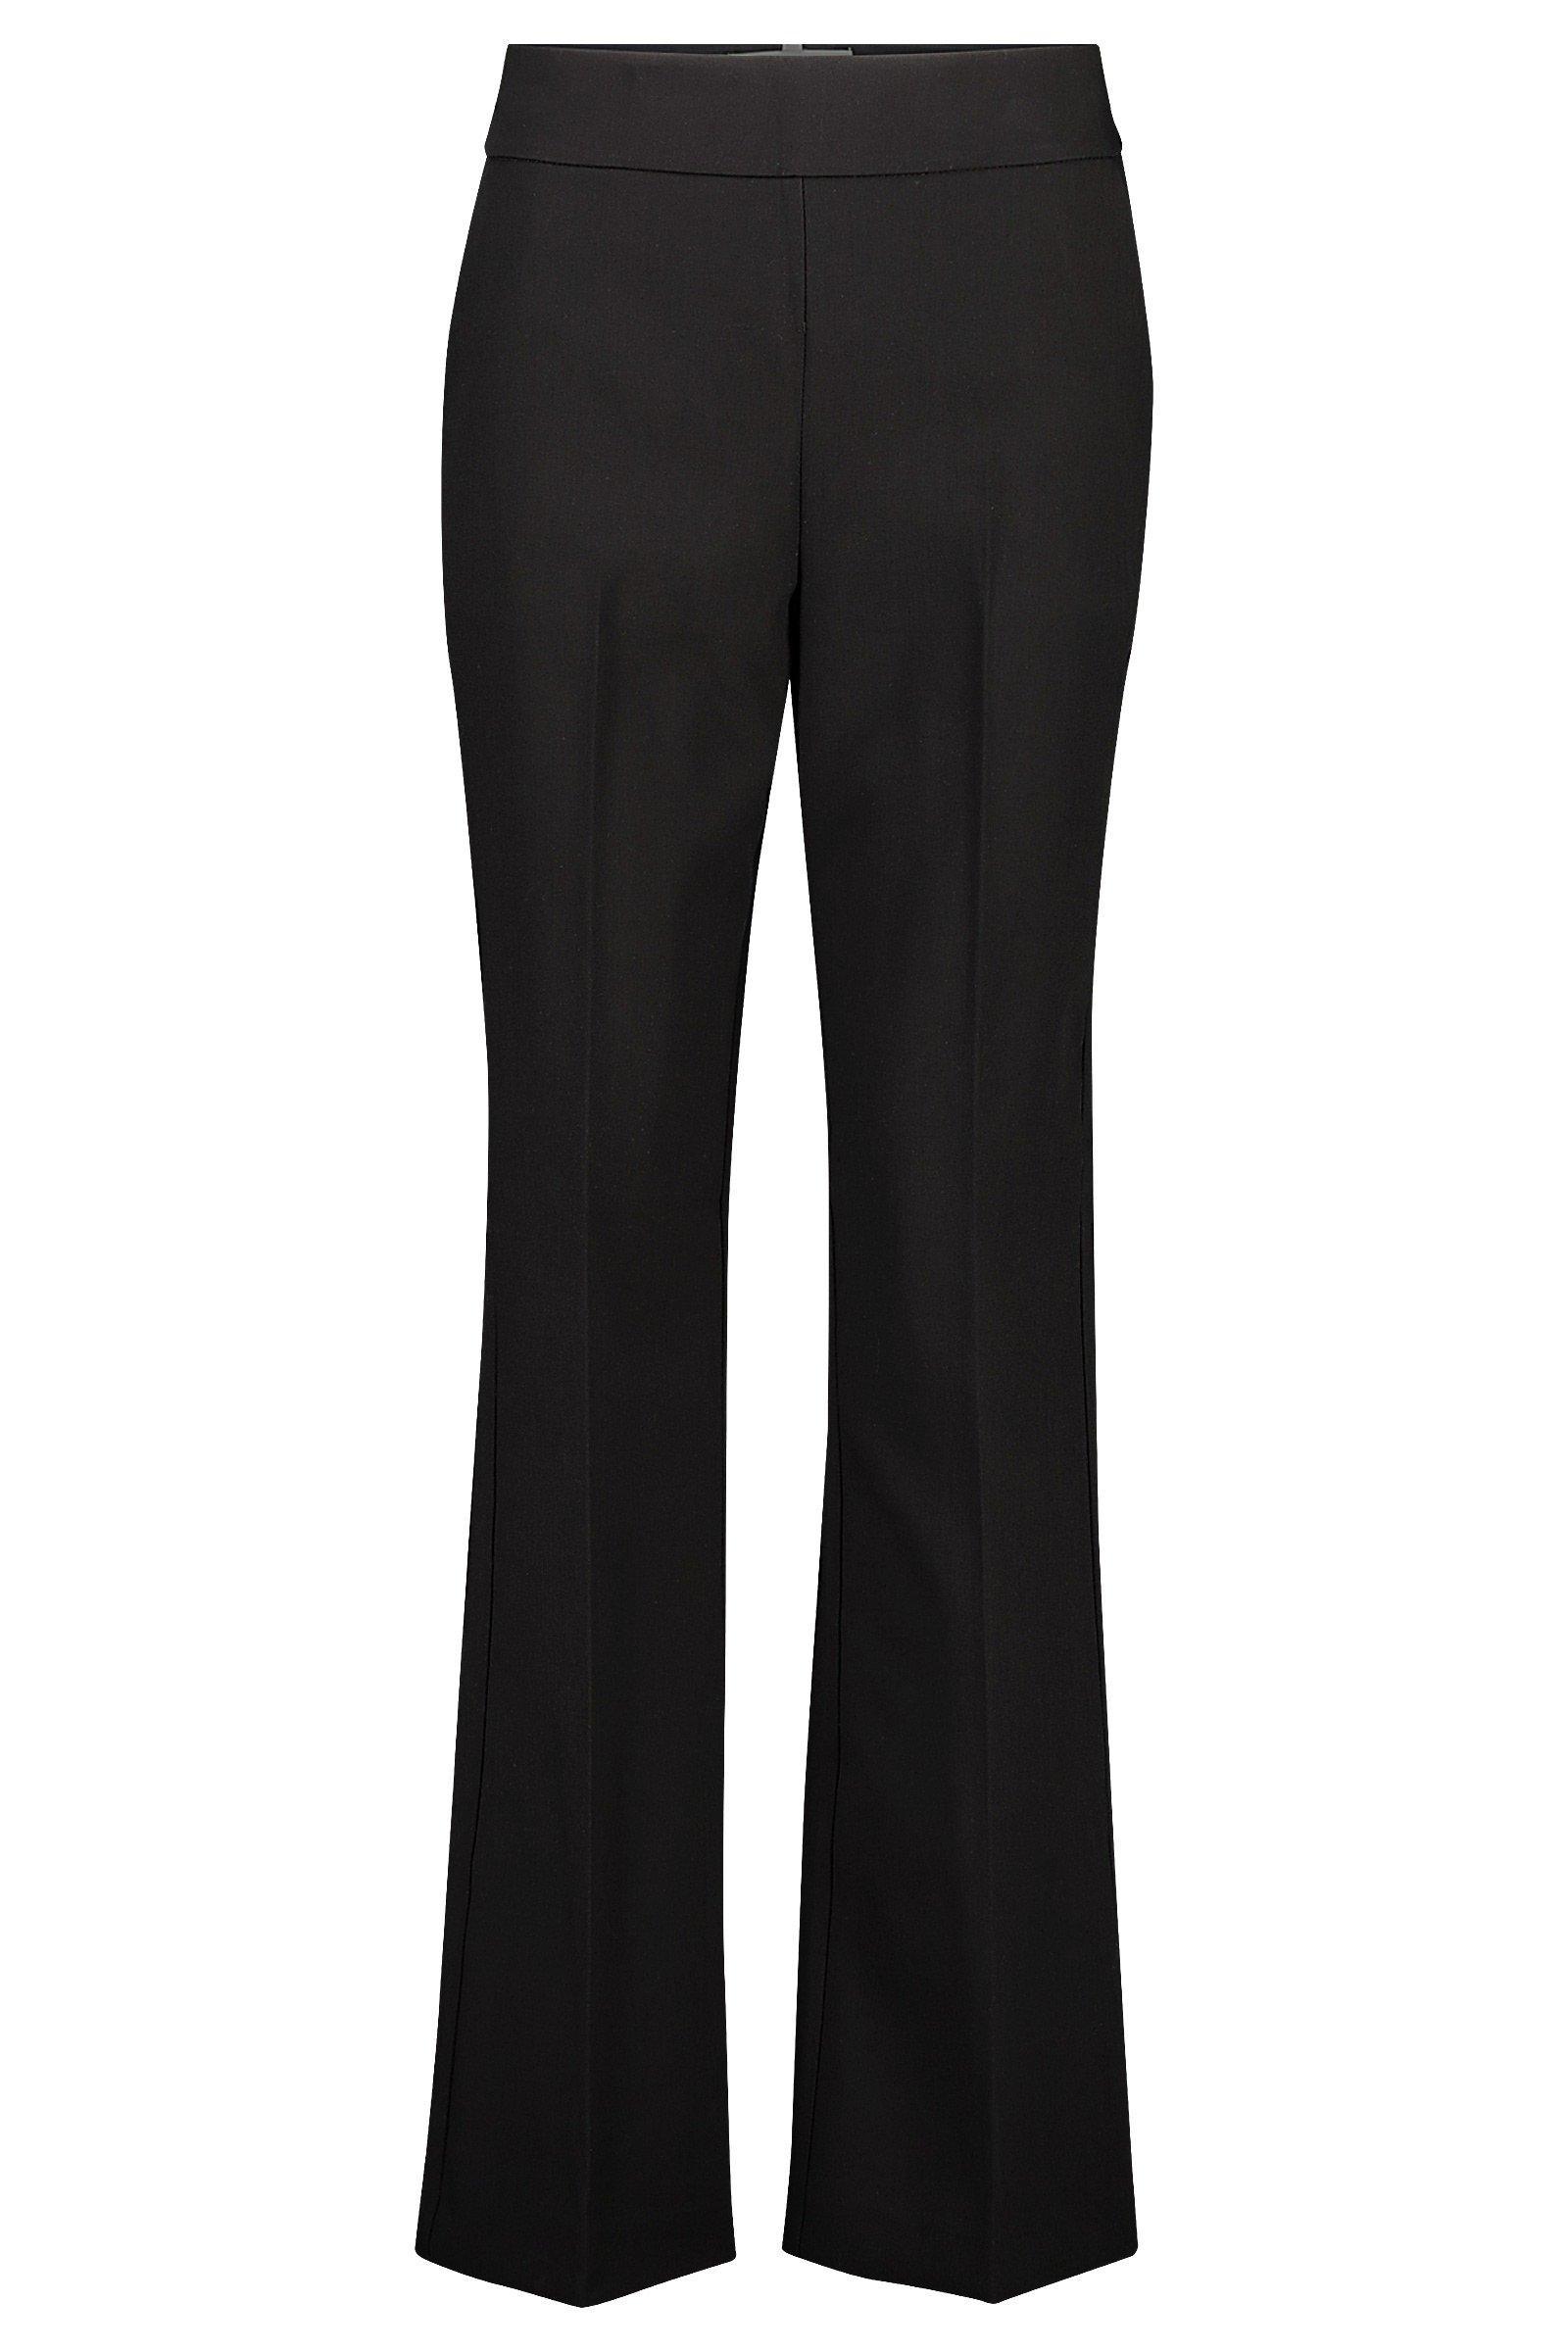 CKS Dames - TAIF - lange broek - zwart